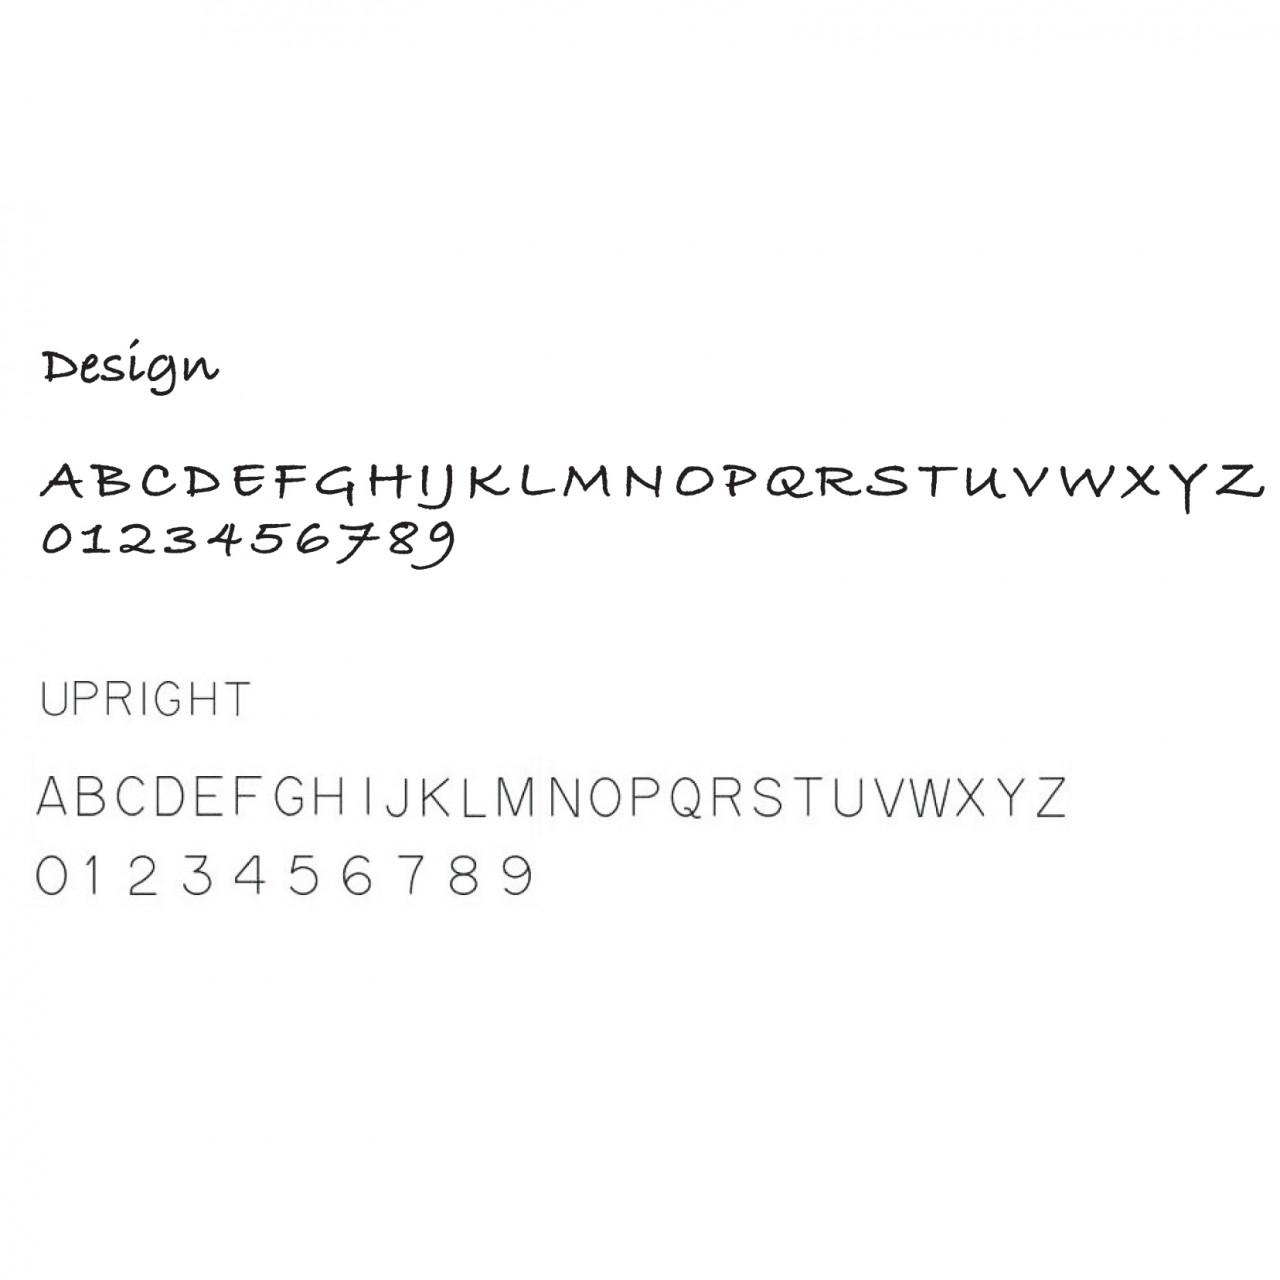 Namensarmband 2 ROLLS NAPPA Lederarmband mit Silberringen 925 Gravur